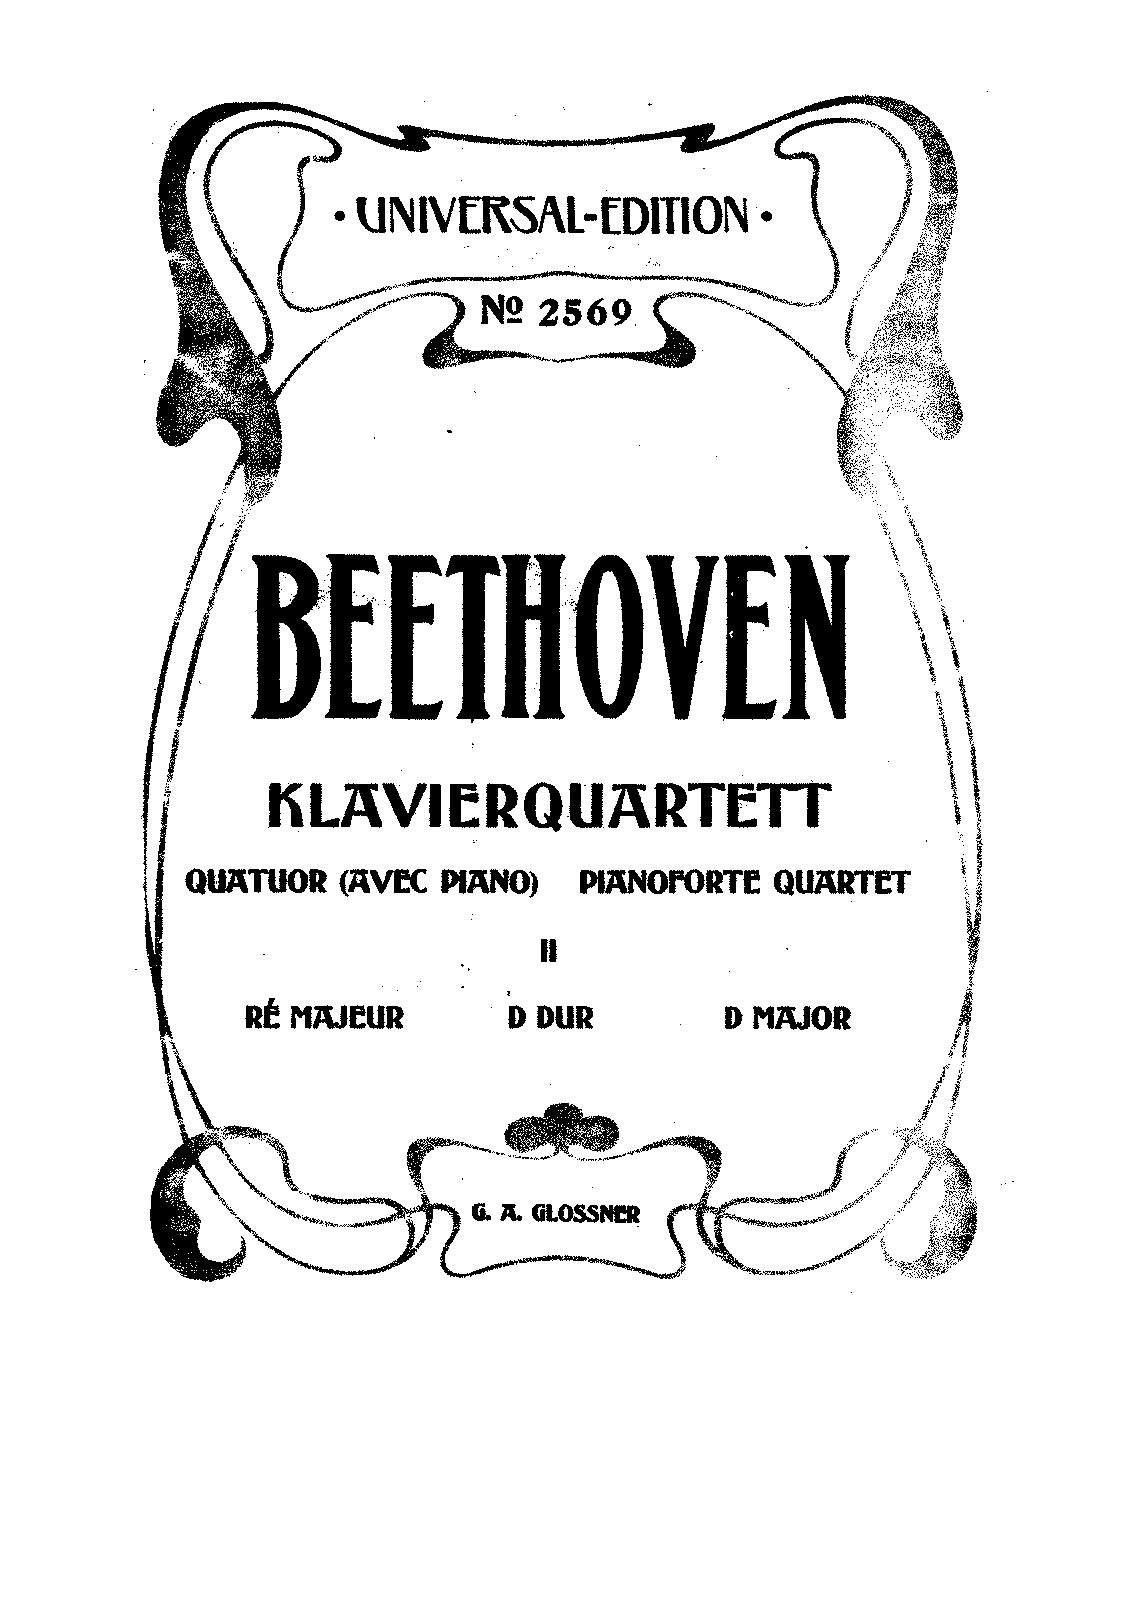 piano quartet no 2 in d major  woo 36  beethoven  ludwig